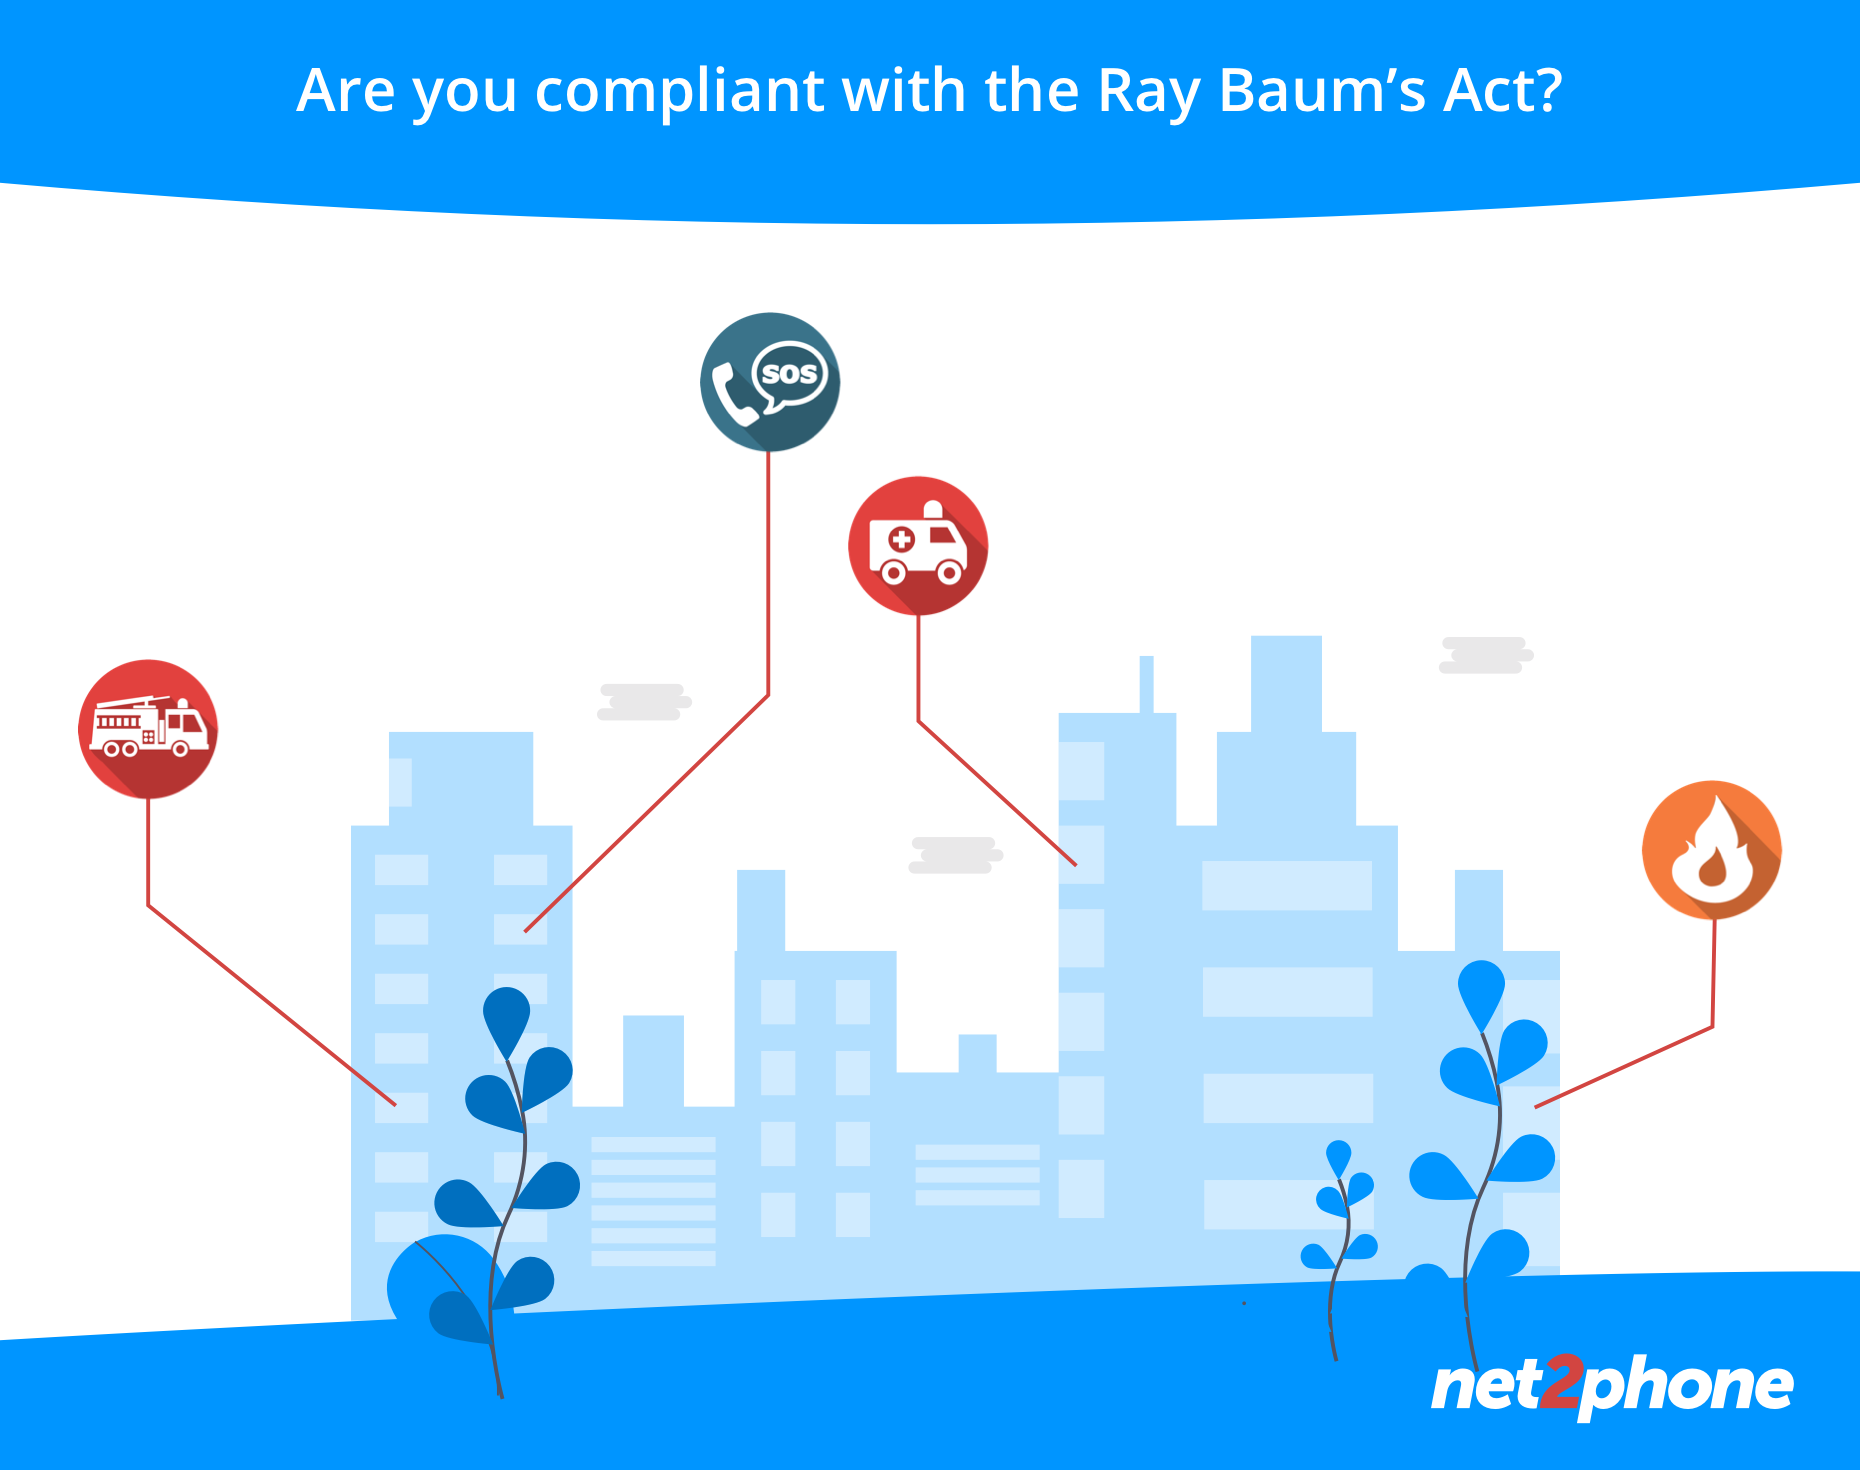 net2phone compliance